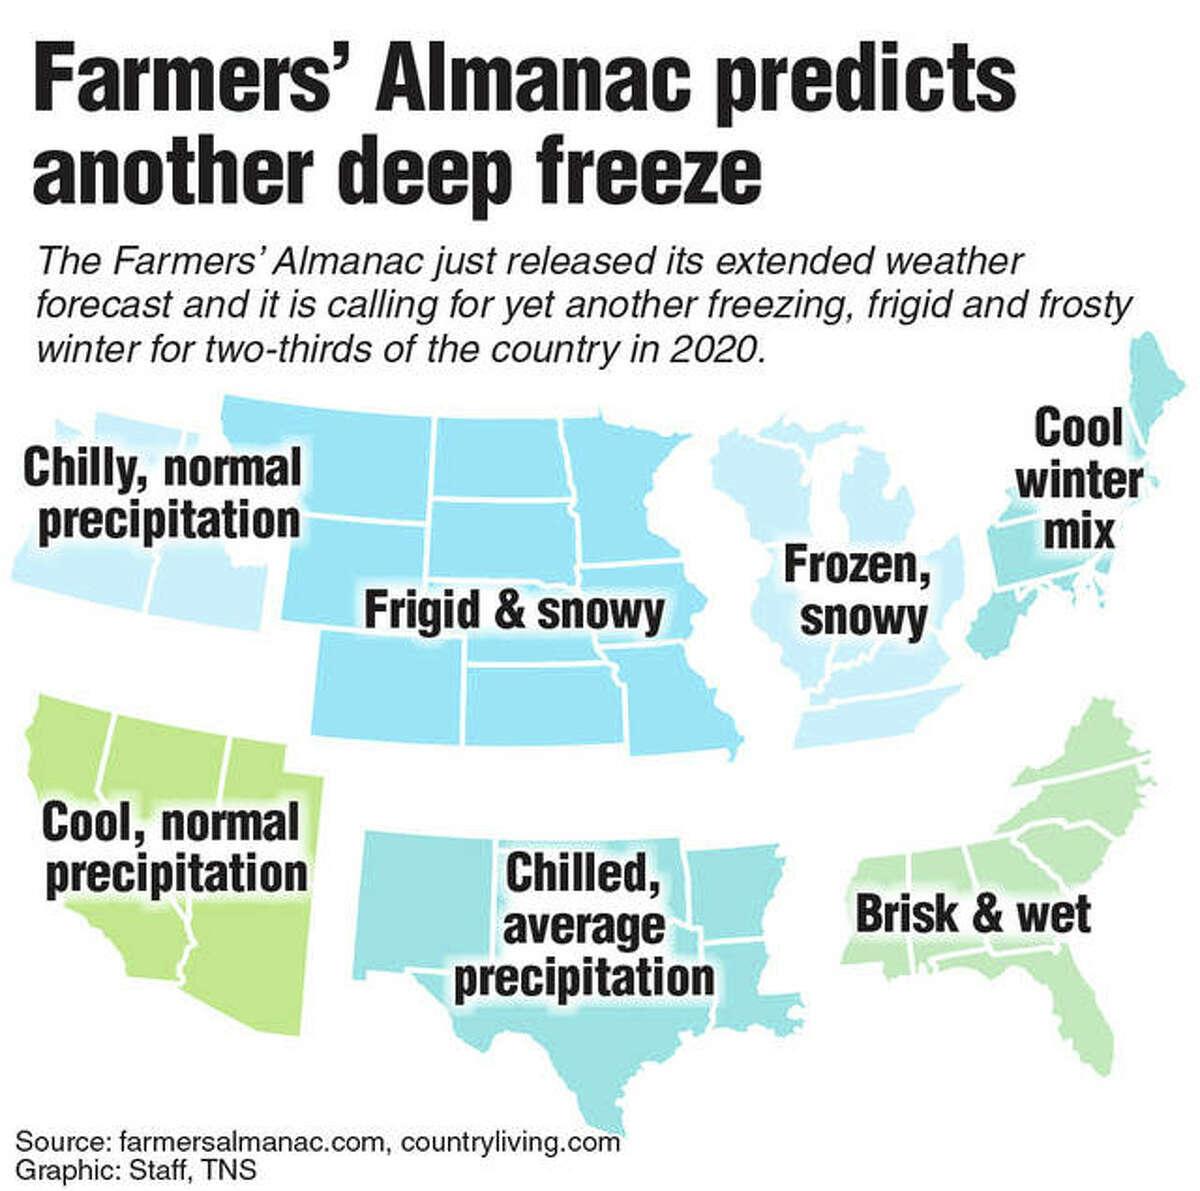 Map of the Farmers' Almanac winter prediction.